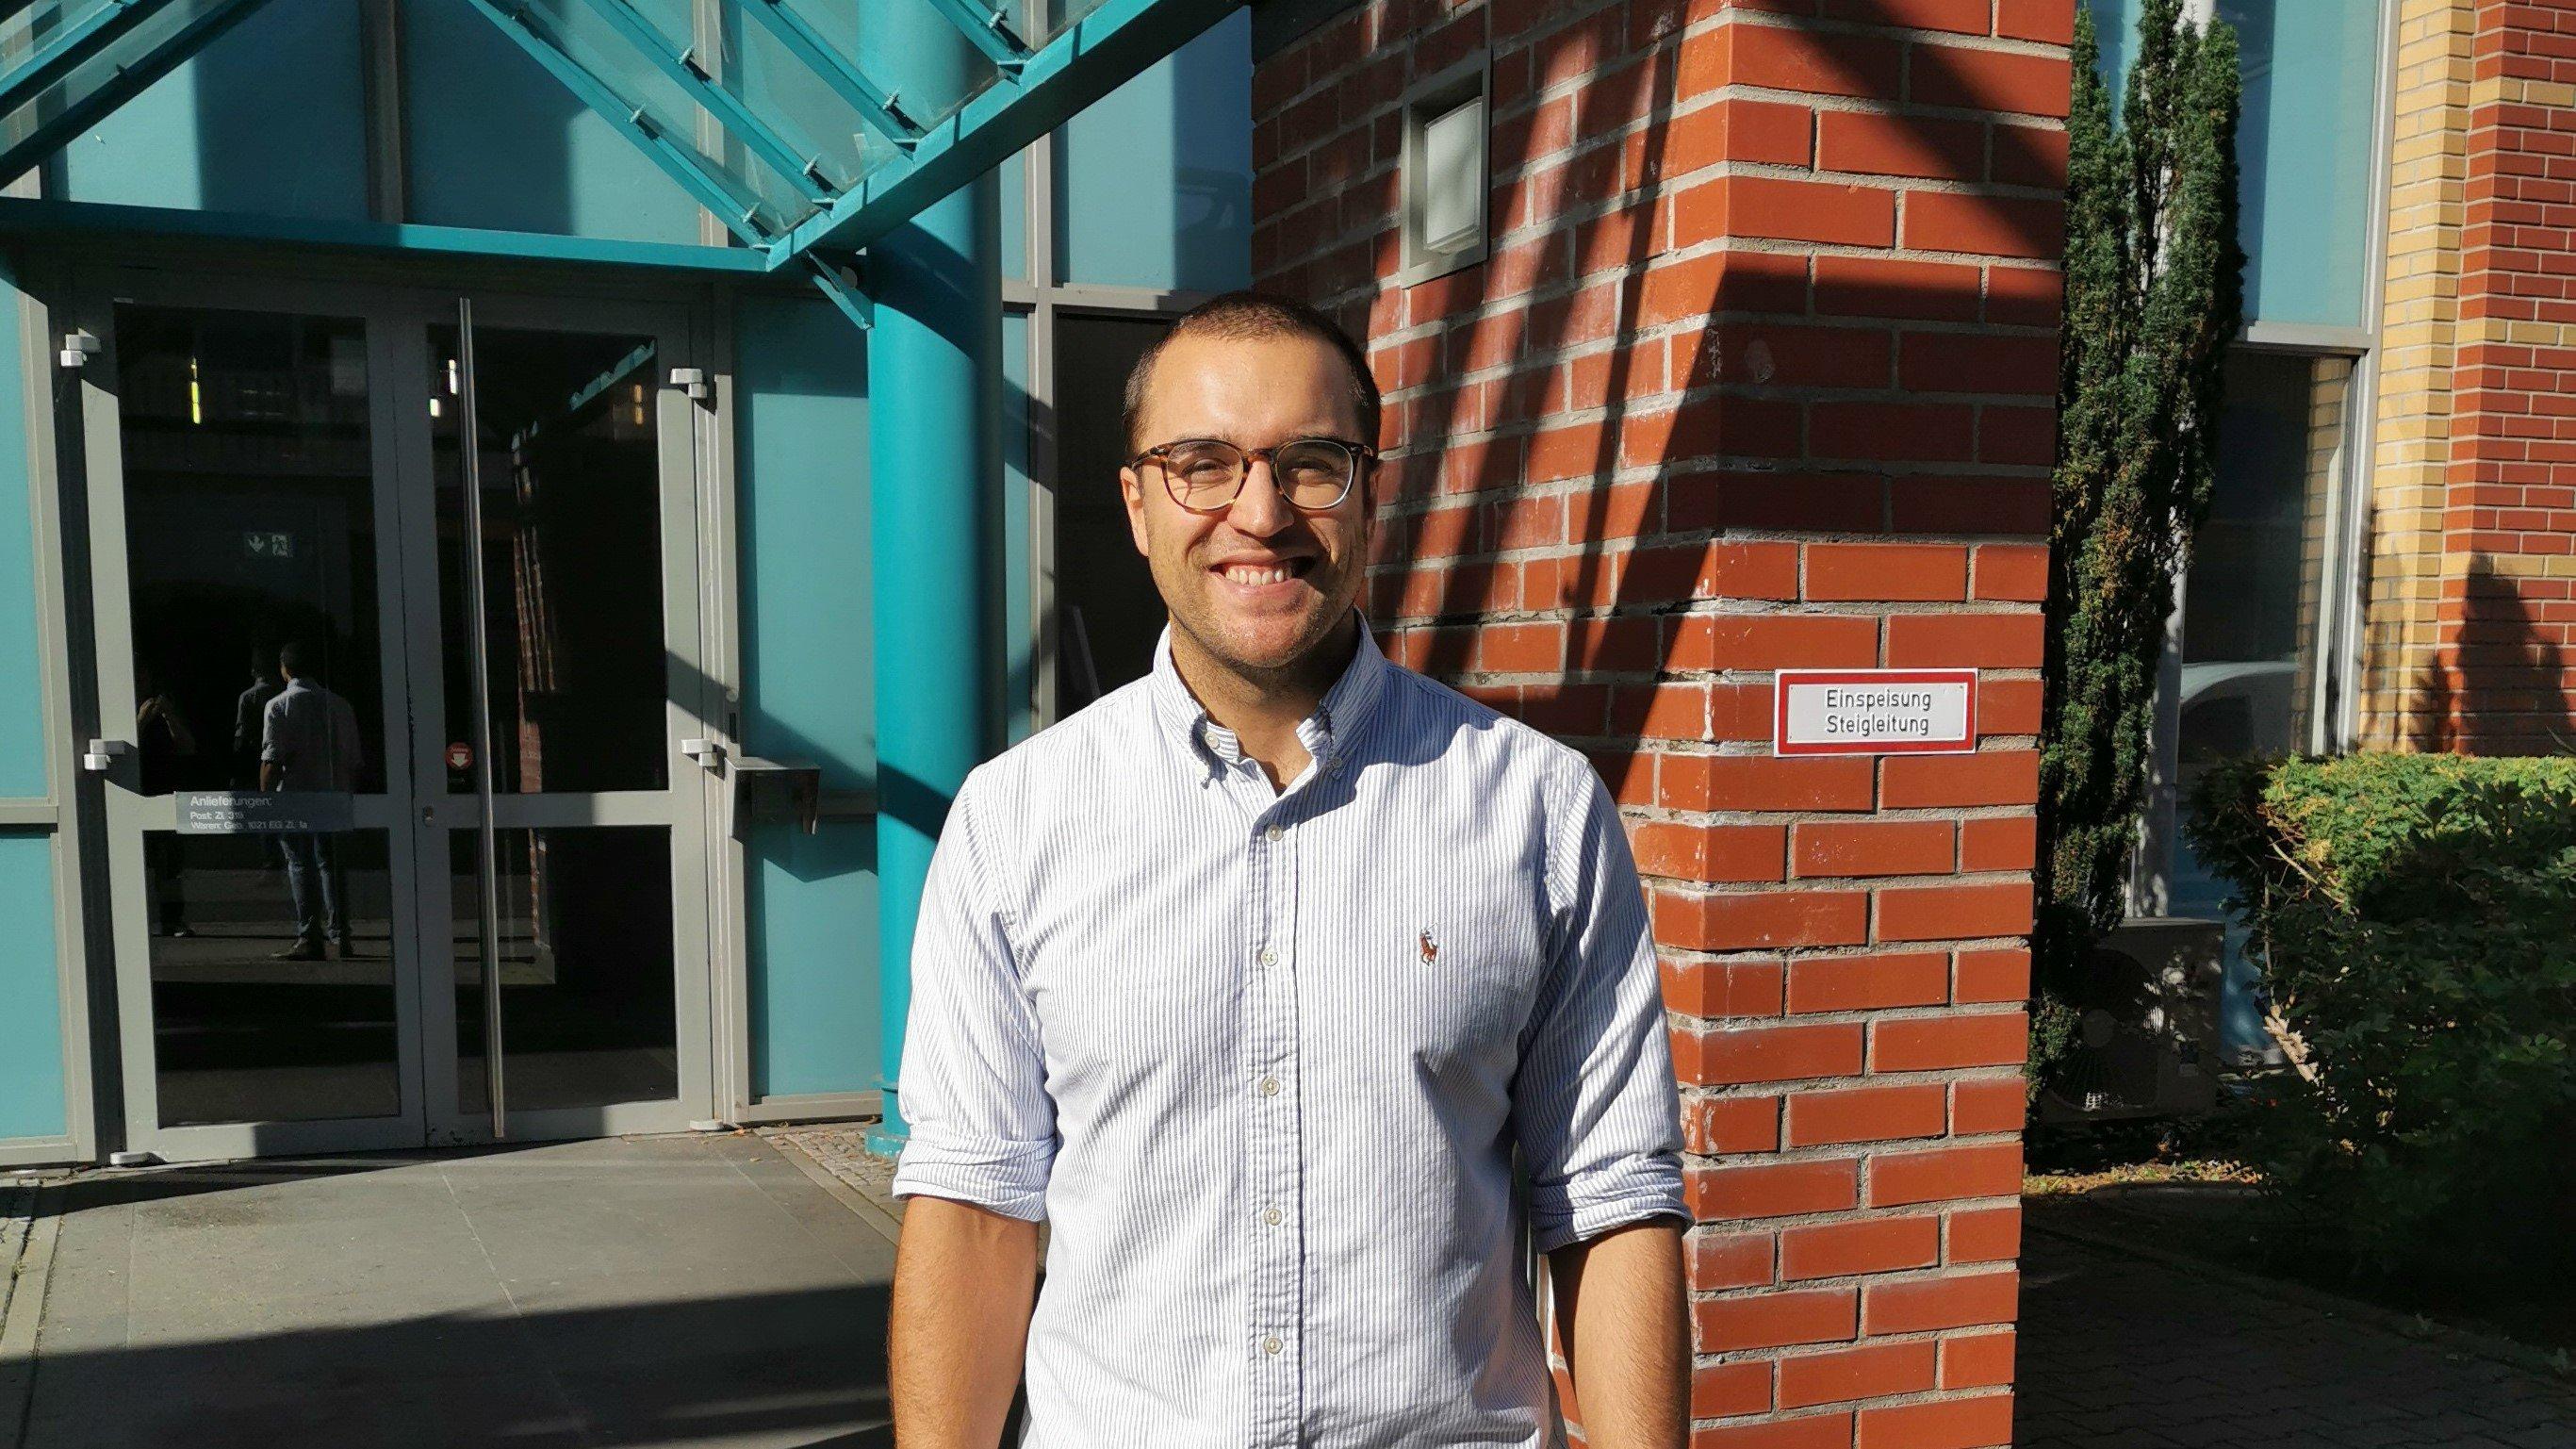 students@Evonik Markus Kokot